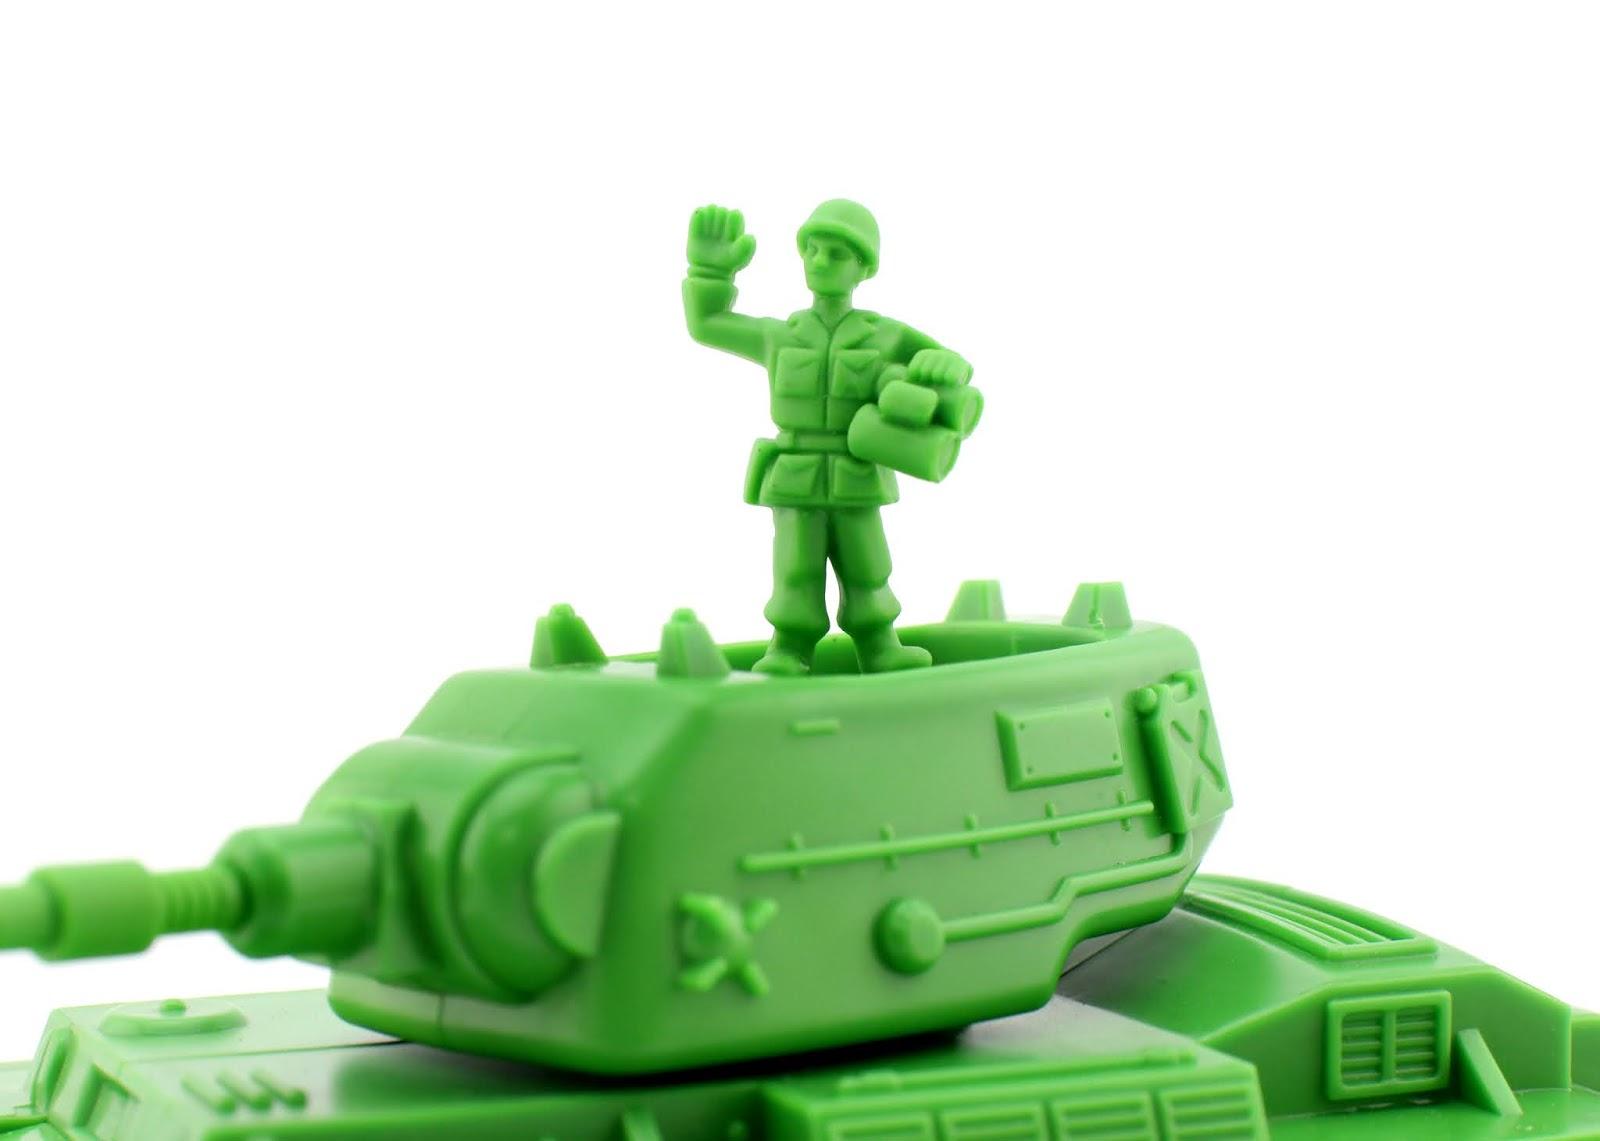 toy story buddy pack army tank mattel